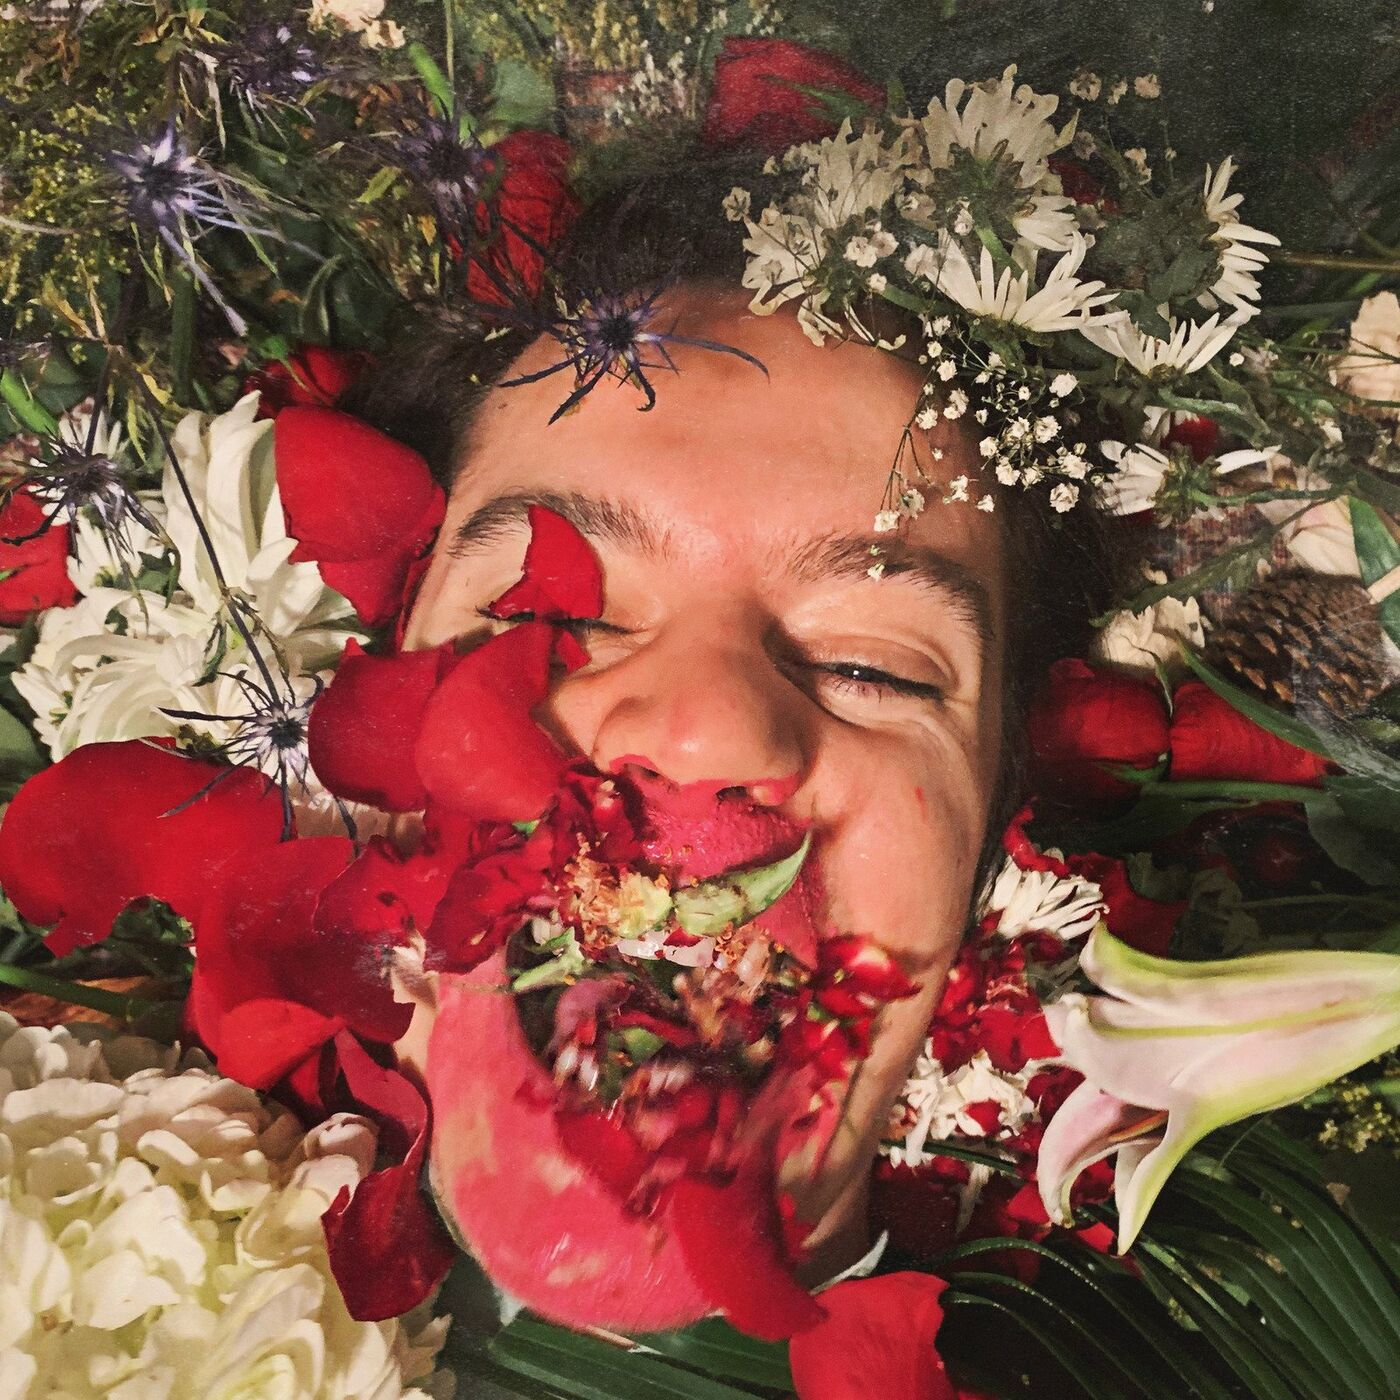 Landon Tewers - Kill Me [single] (2021)